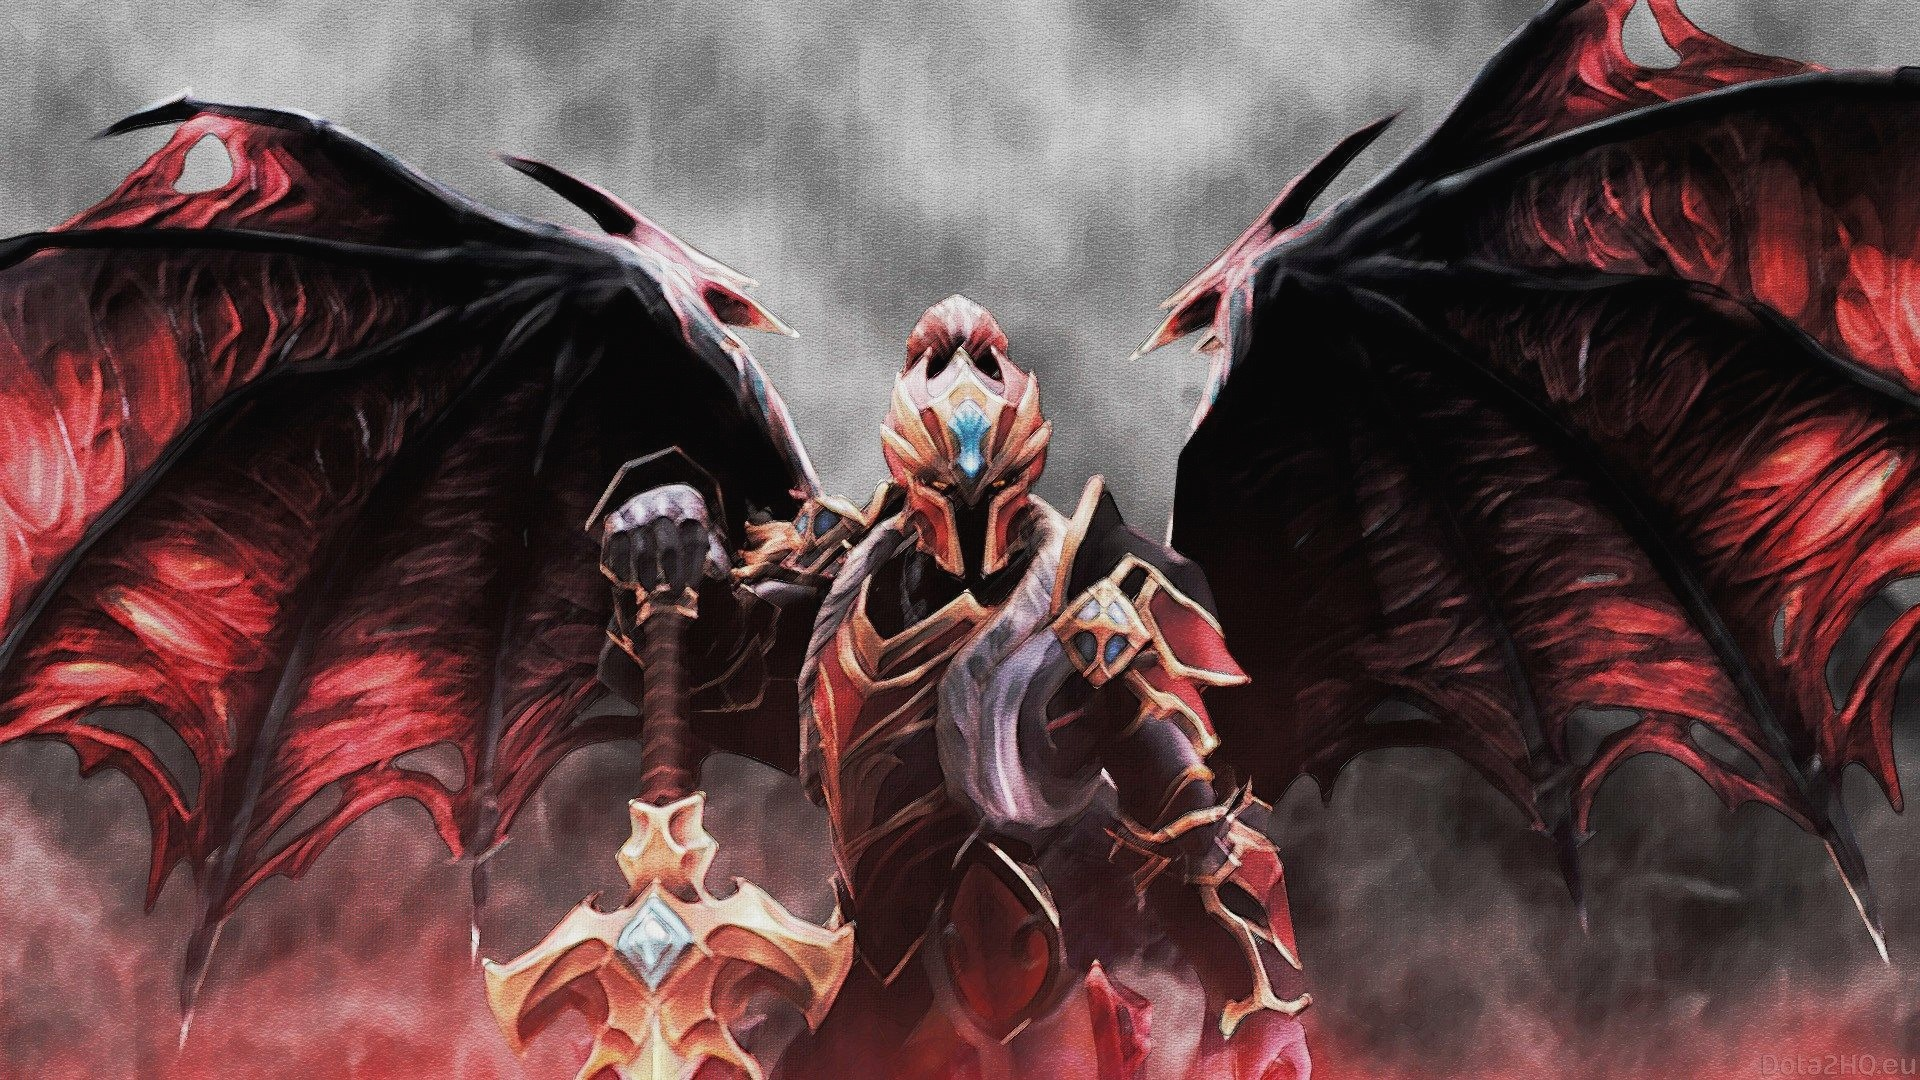 10 Dota 2 Dragon Knight Wallpaper Hd - Dragon Knight Dota 2 Wallpaper Hd , HD Wallpaper & Backgrounds